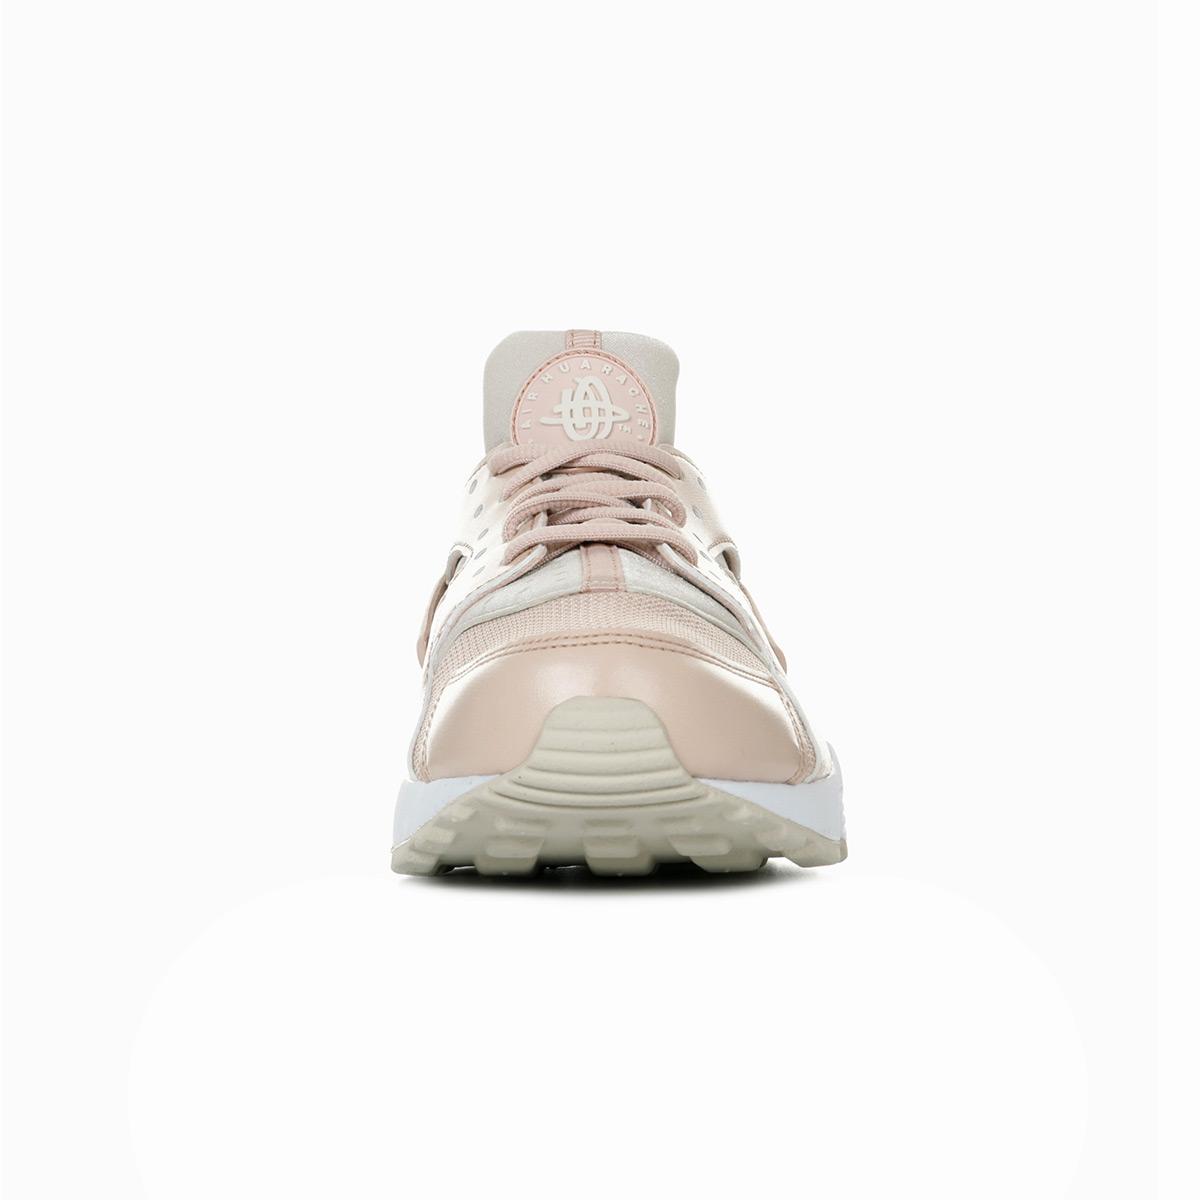 Chaussures-Baskets-Nike-femme-Wn-039-s-Air-Huarache-Run-034-Desert-Sand-034-taille-Beige miniature 5